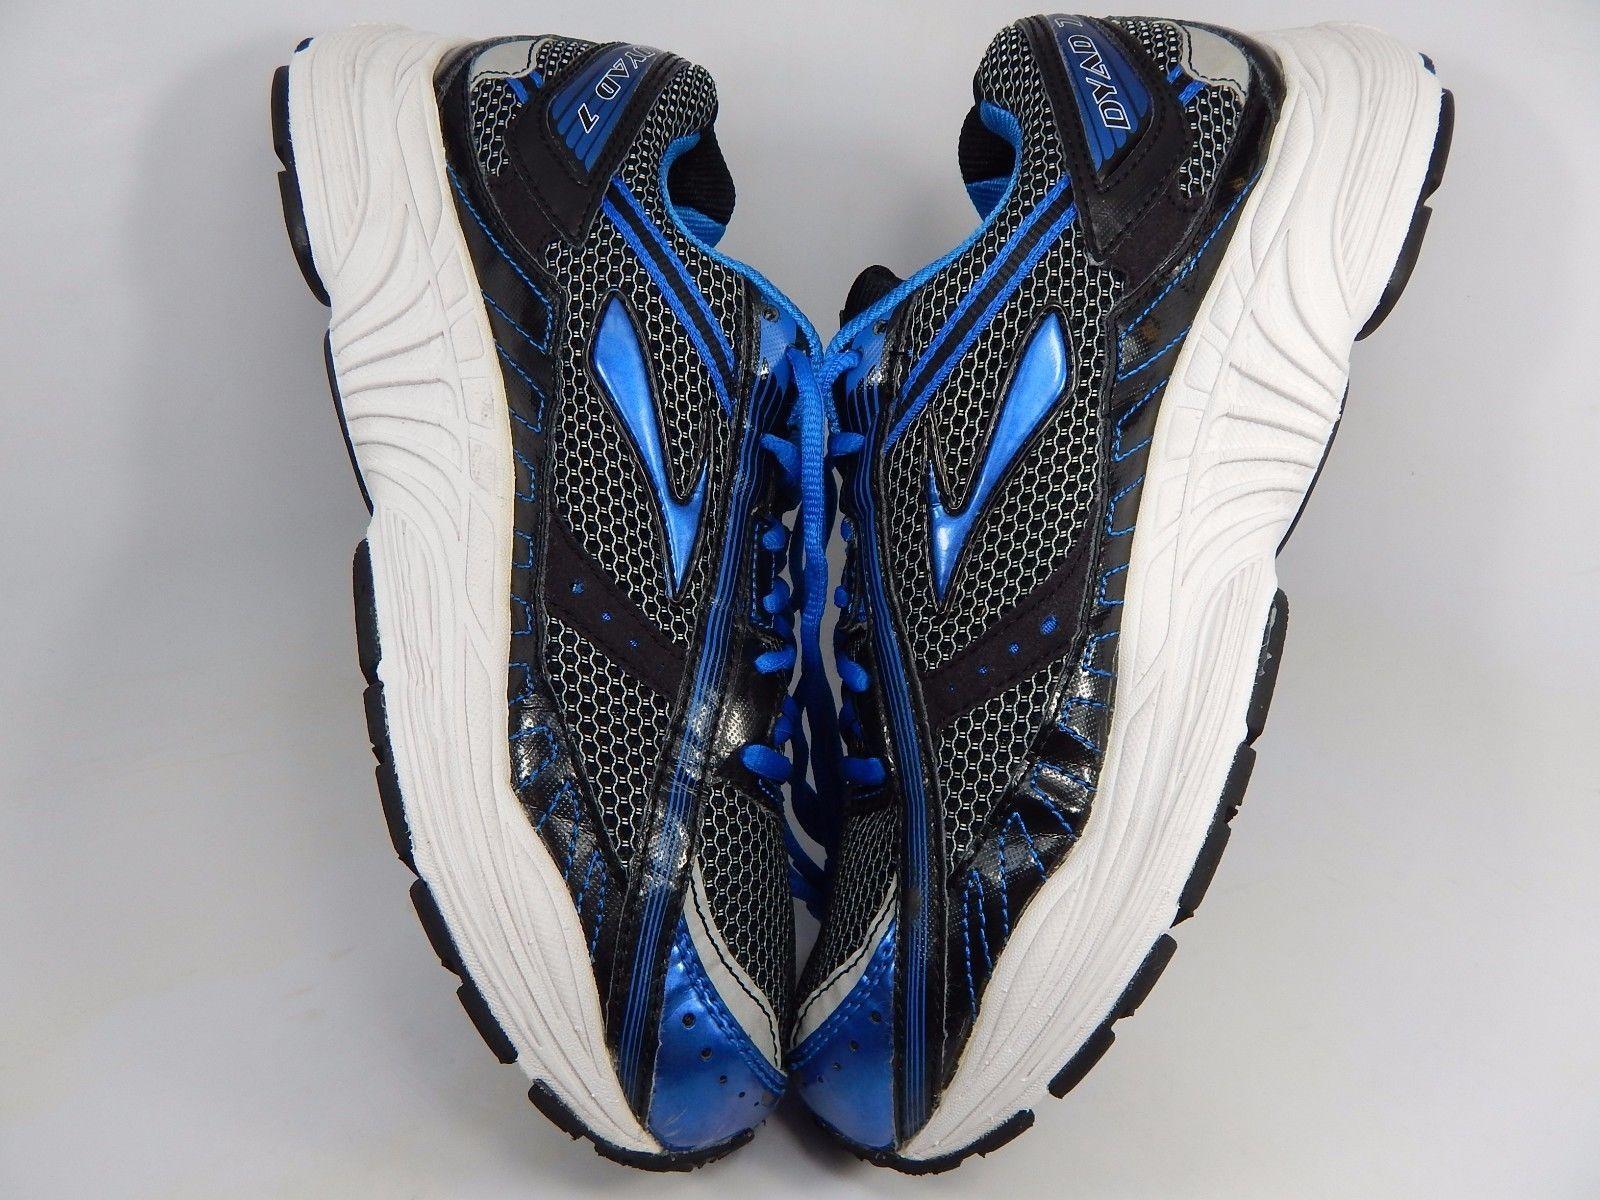 Brooks Dyad 7 Men's Running Shoes Size US 9 4E EXTRA WIDE EU 42.5 1101214E068